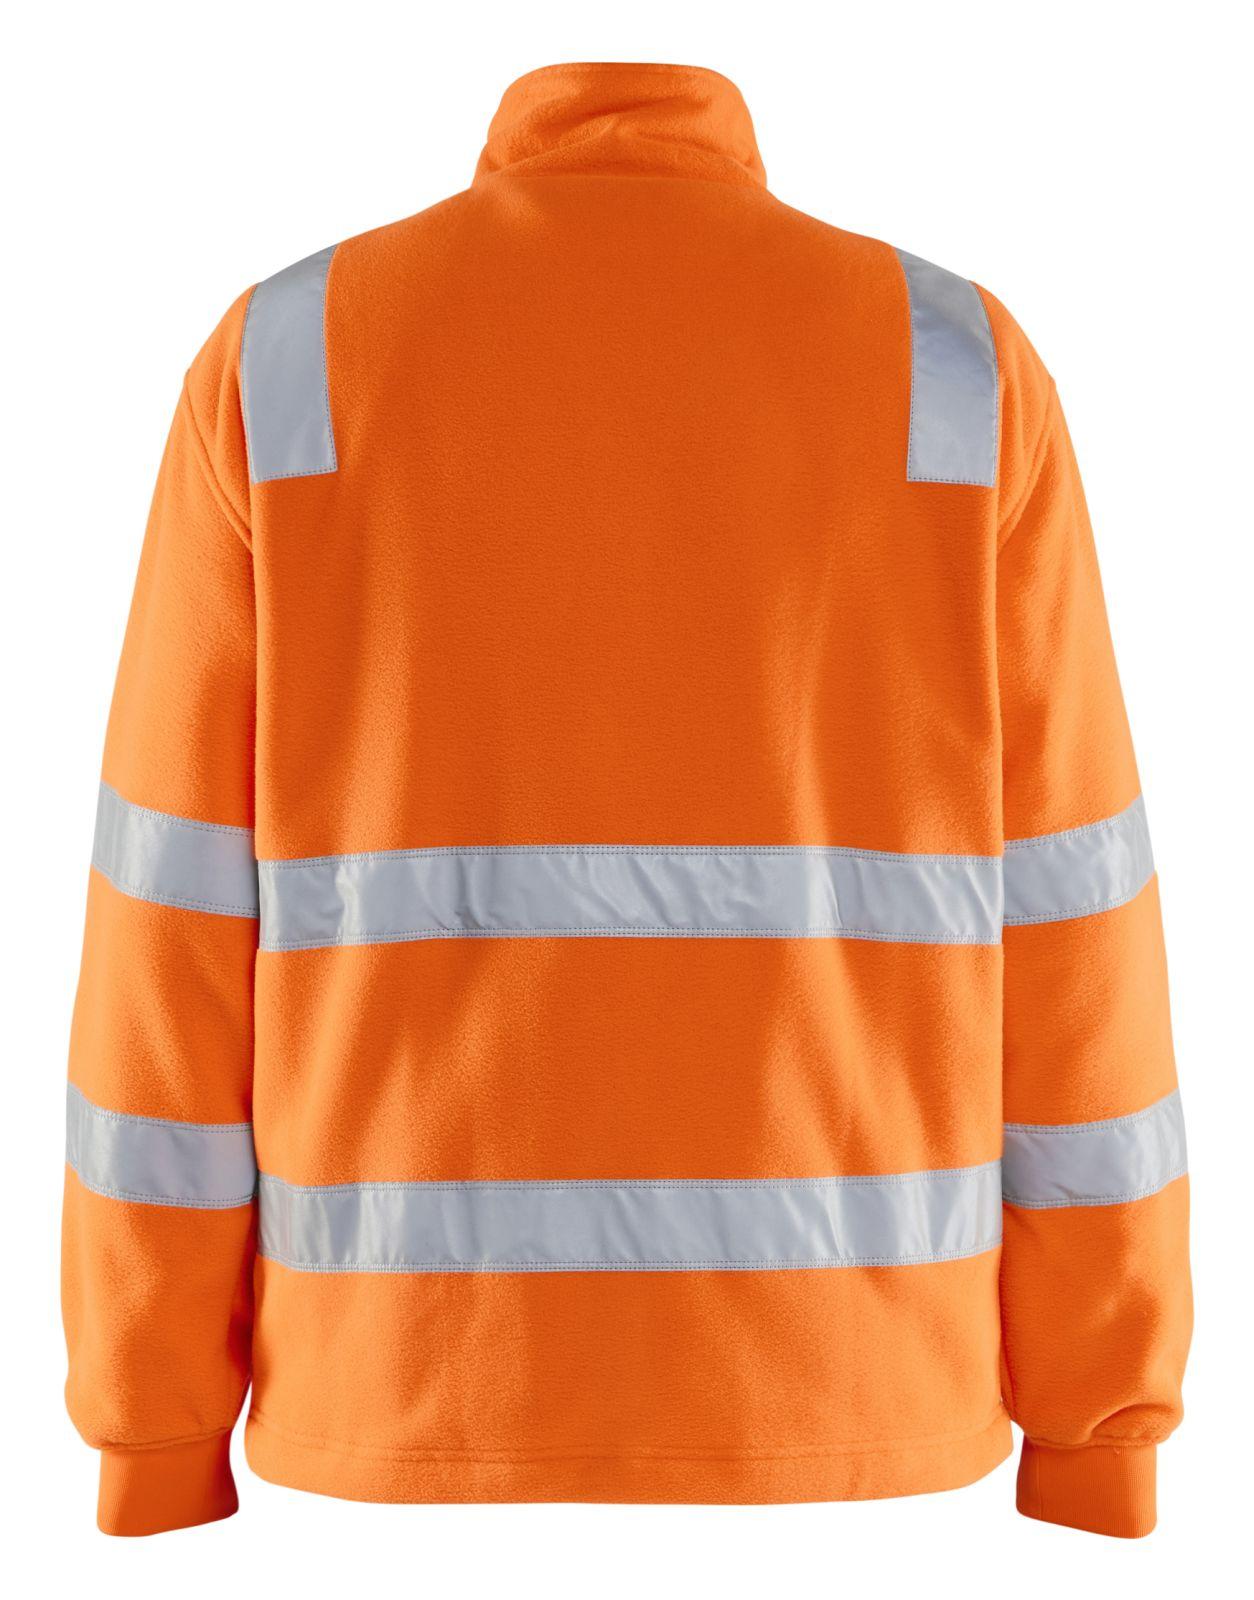 Blaklader Fleece vesten 48532560 High Vis oranje(5300)